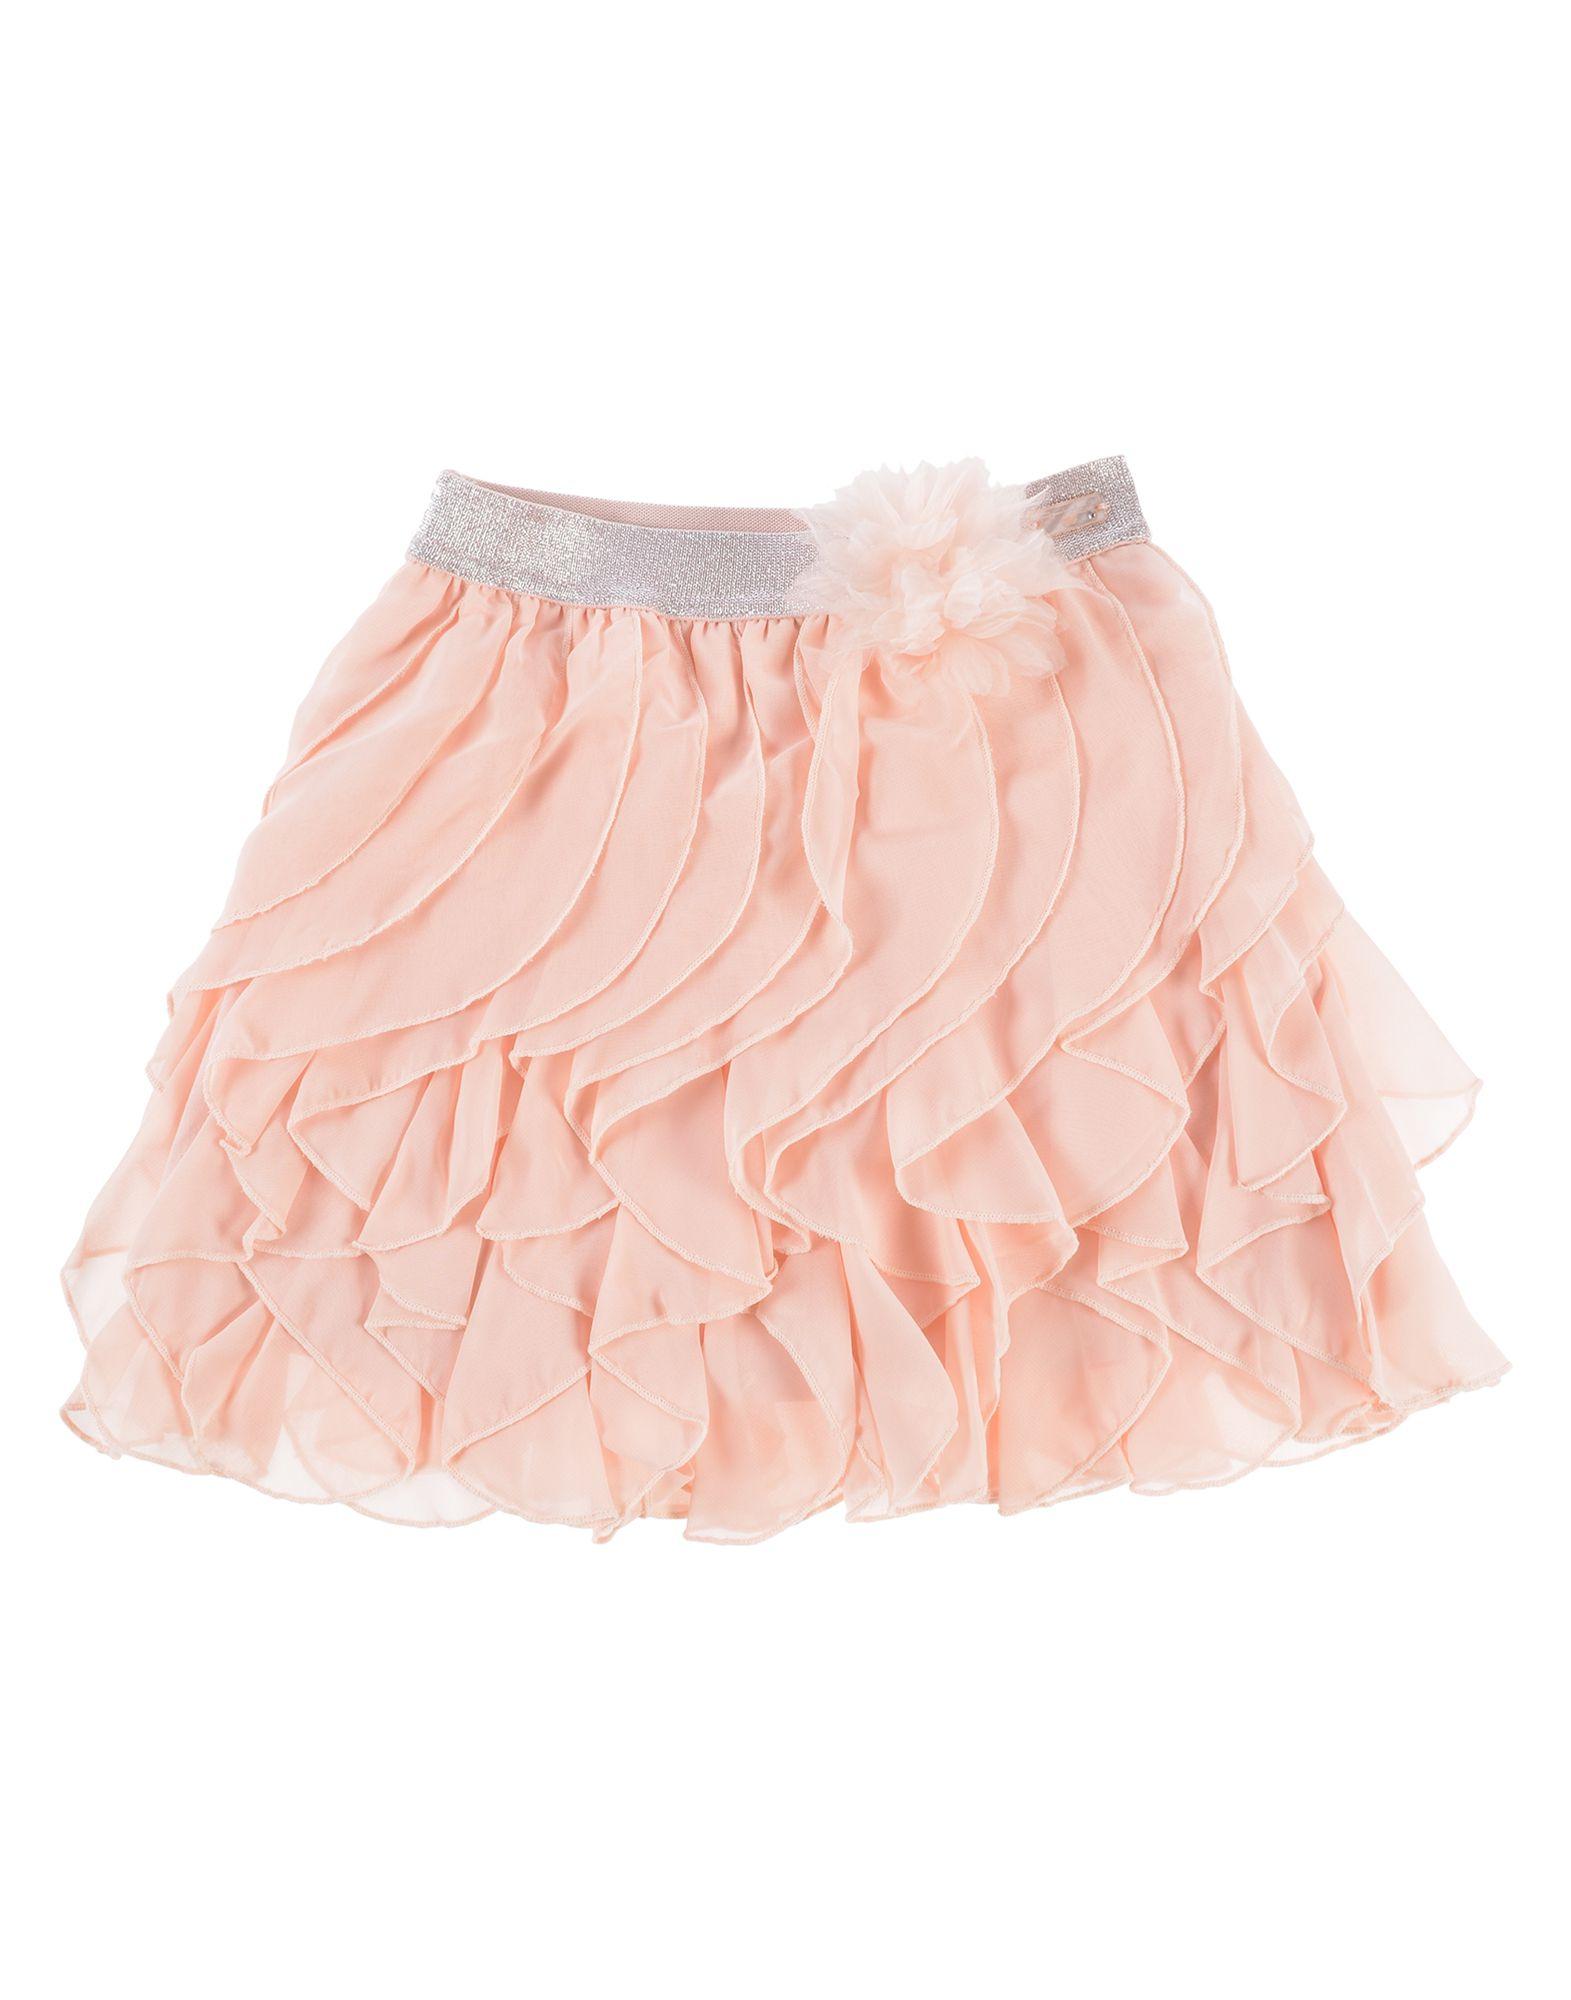 ARTIGLI Girl Юбка artigli юбка для девочки a04557 13 разноцветный artigli